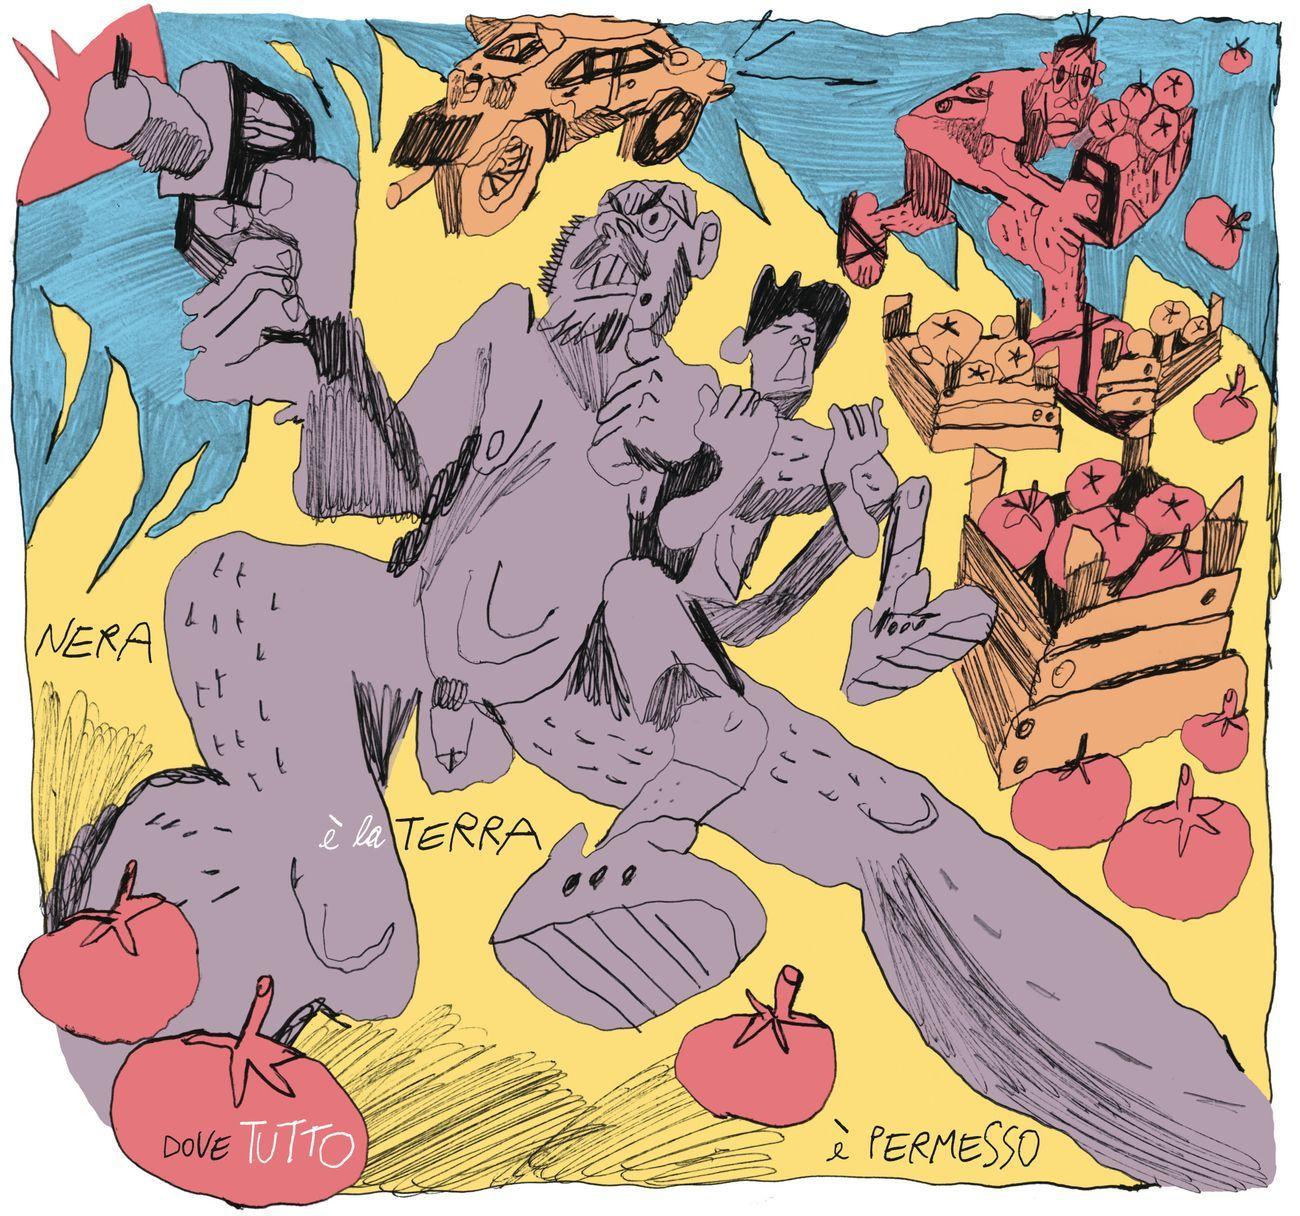 La tavola di Martoz per Artribune Magazine #56